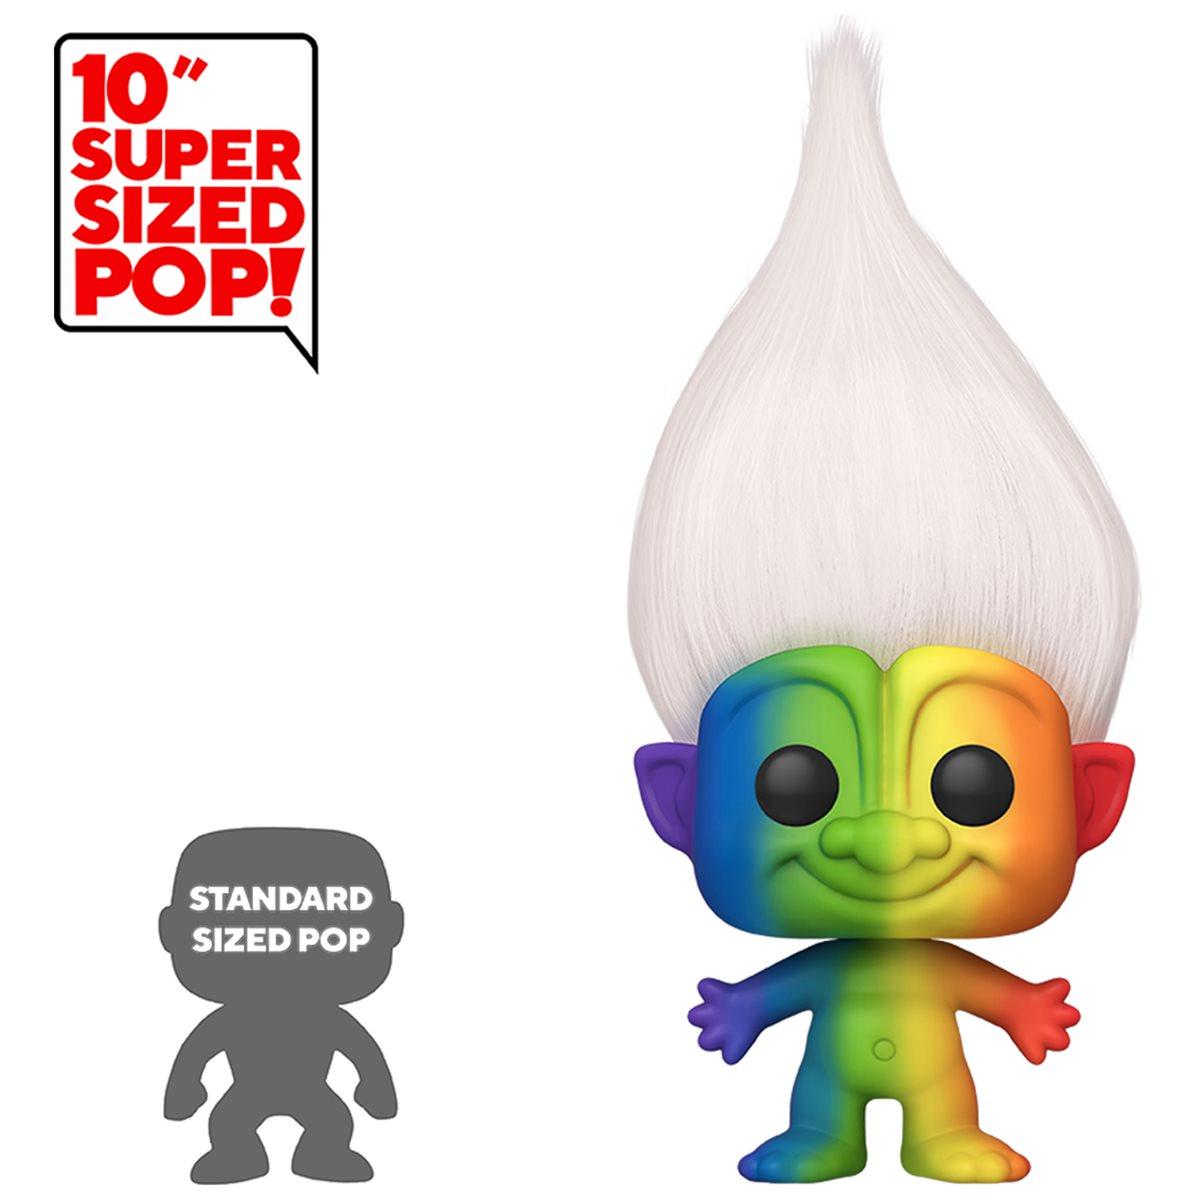 Trolls Funko Pop!: Toy New Rainbow Troll